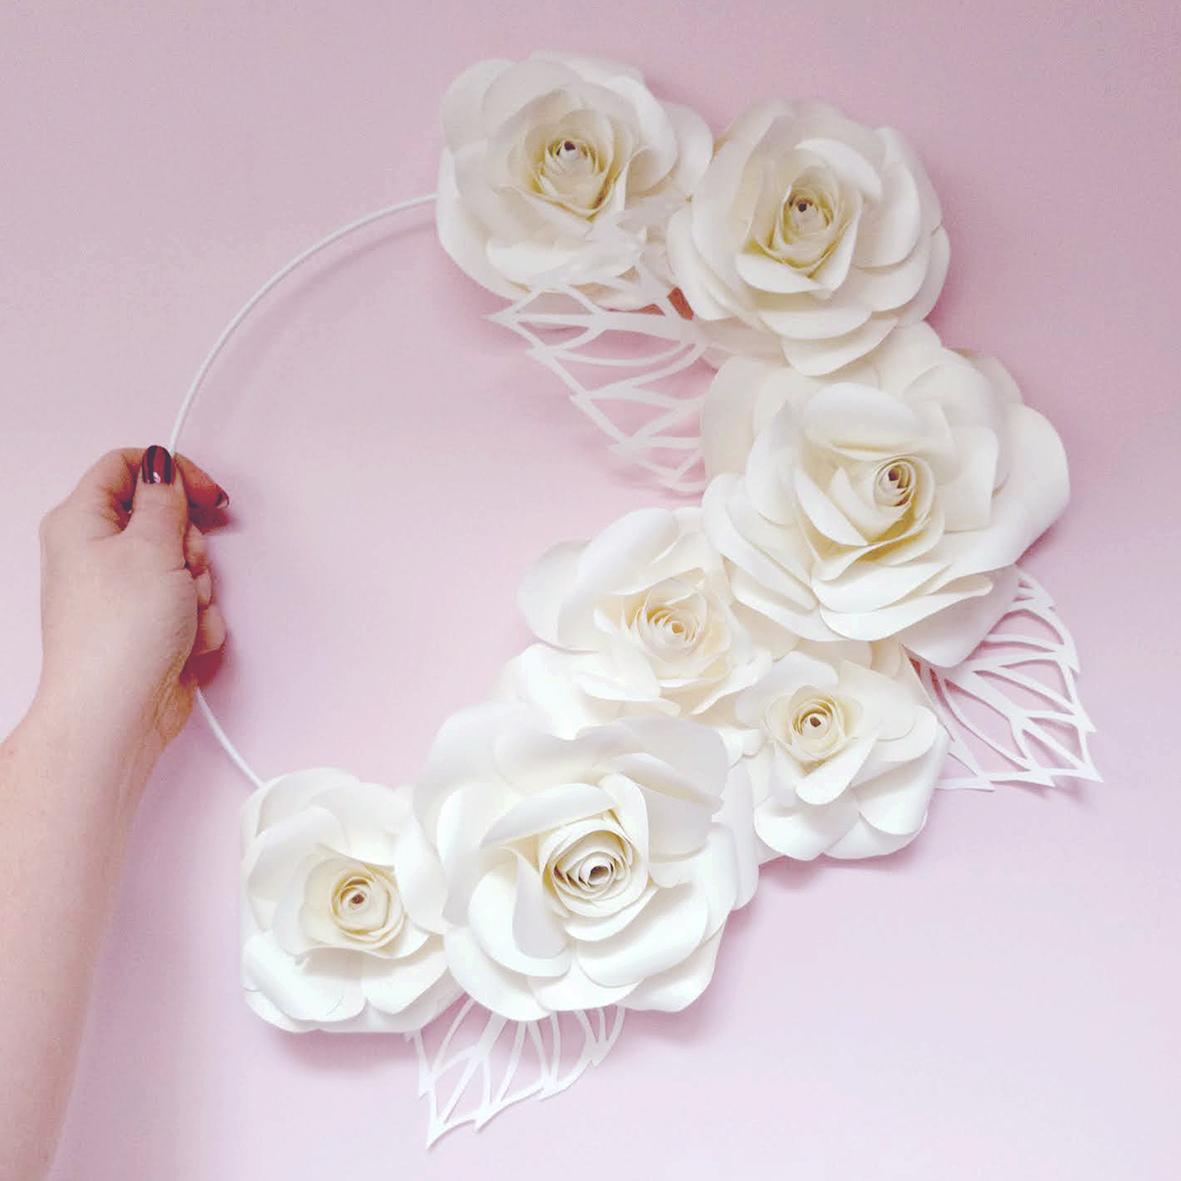 paperflowerkrans-papier-krans-studiocooliejoelie-bloemen